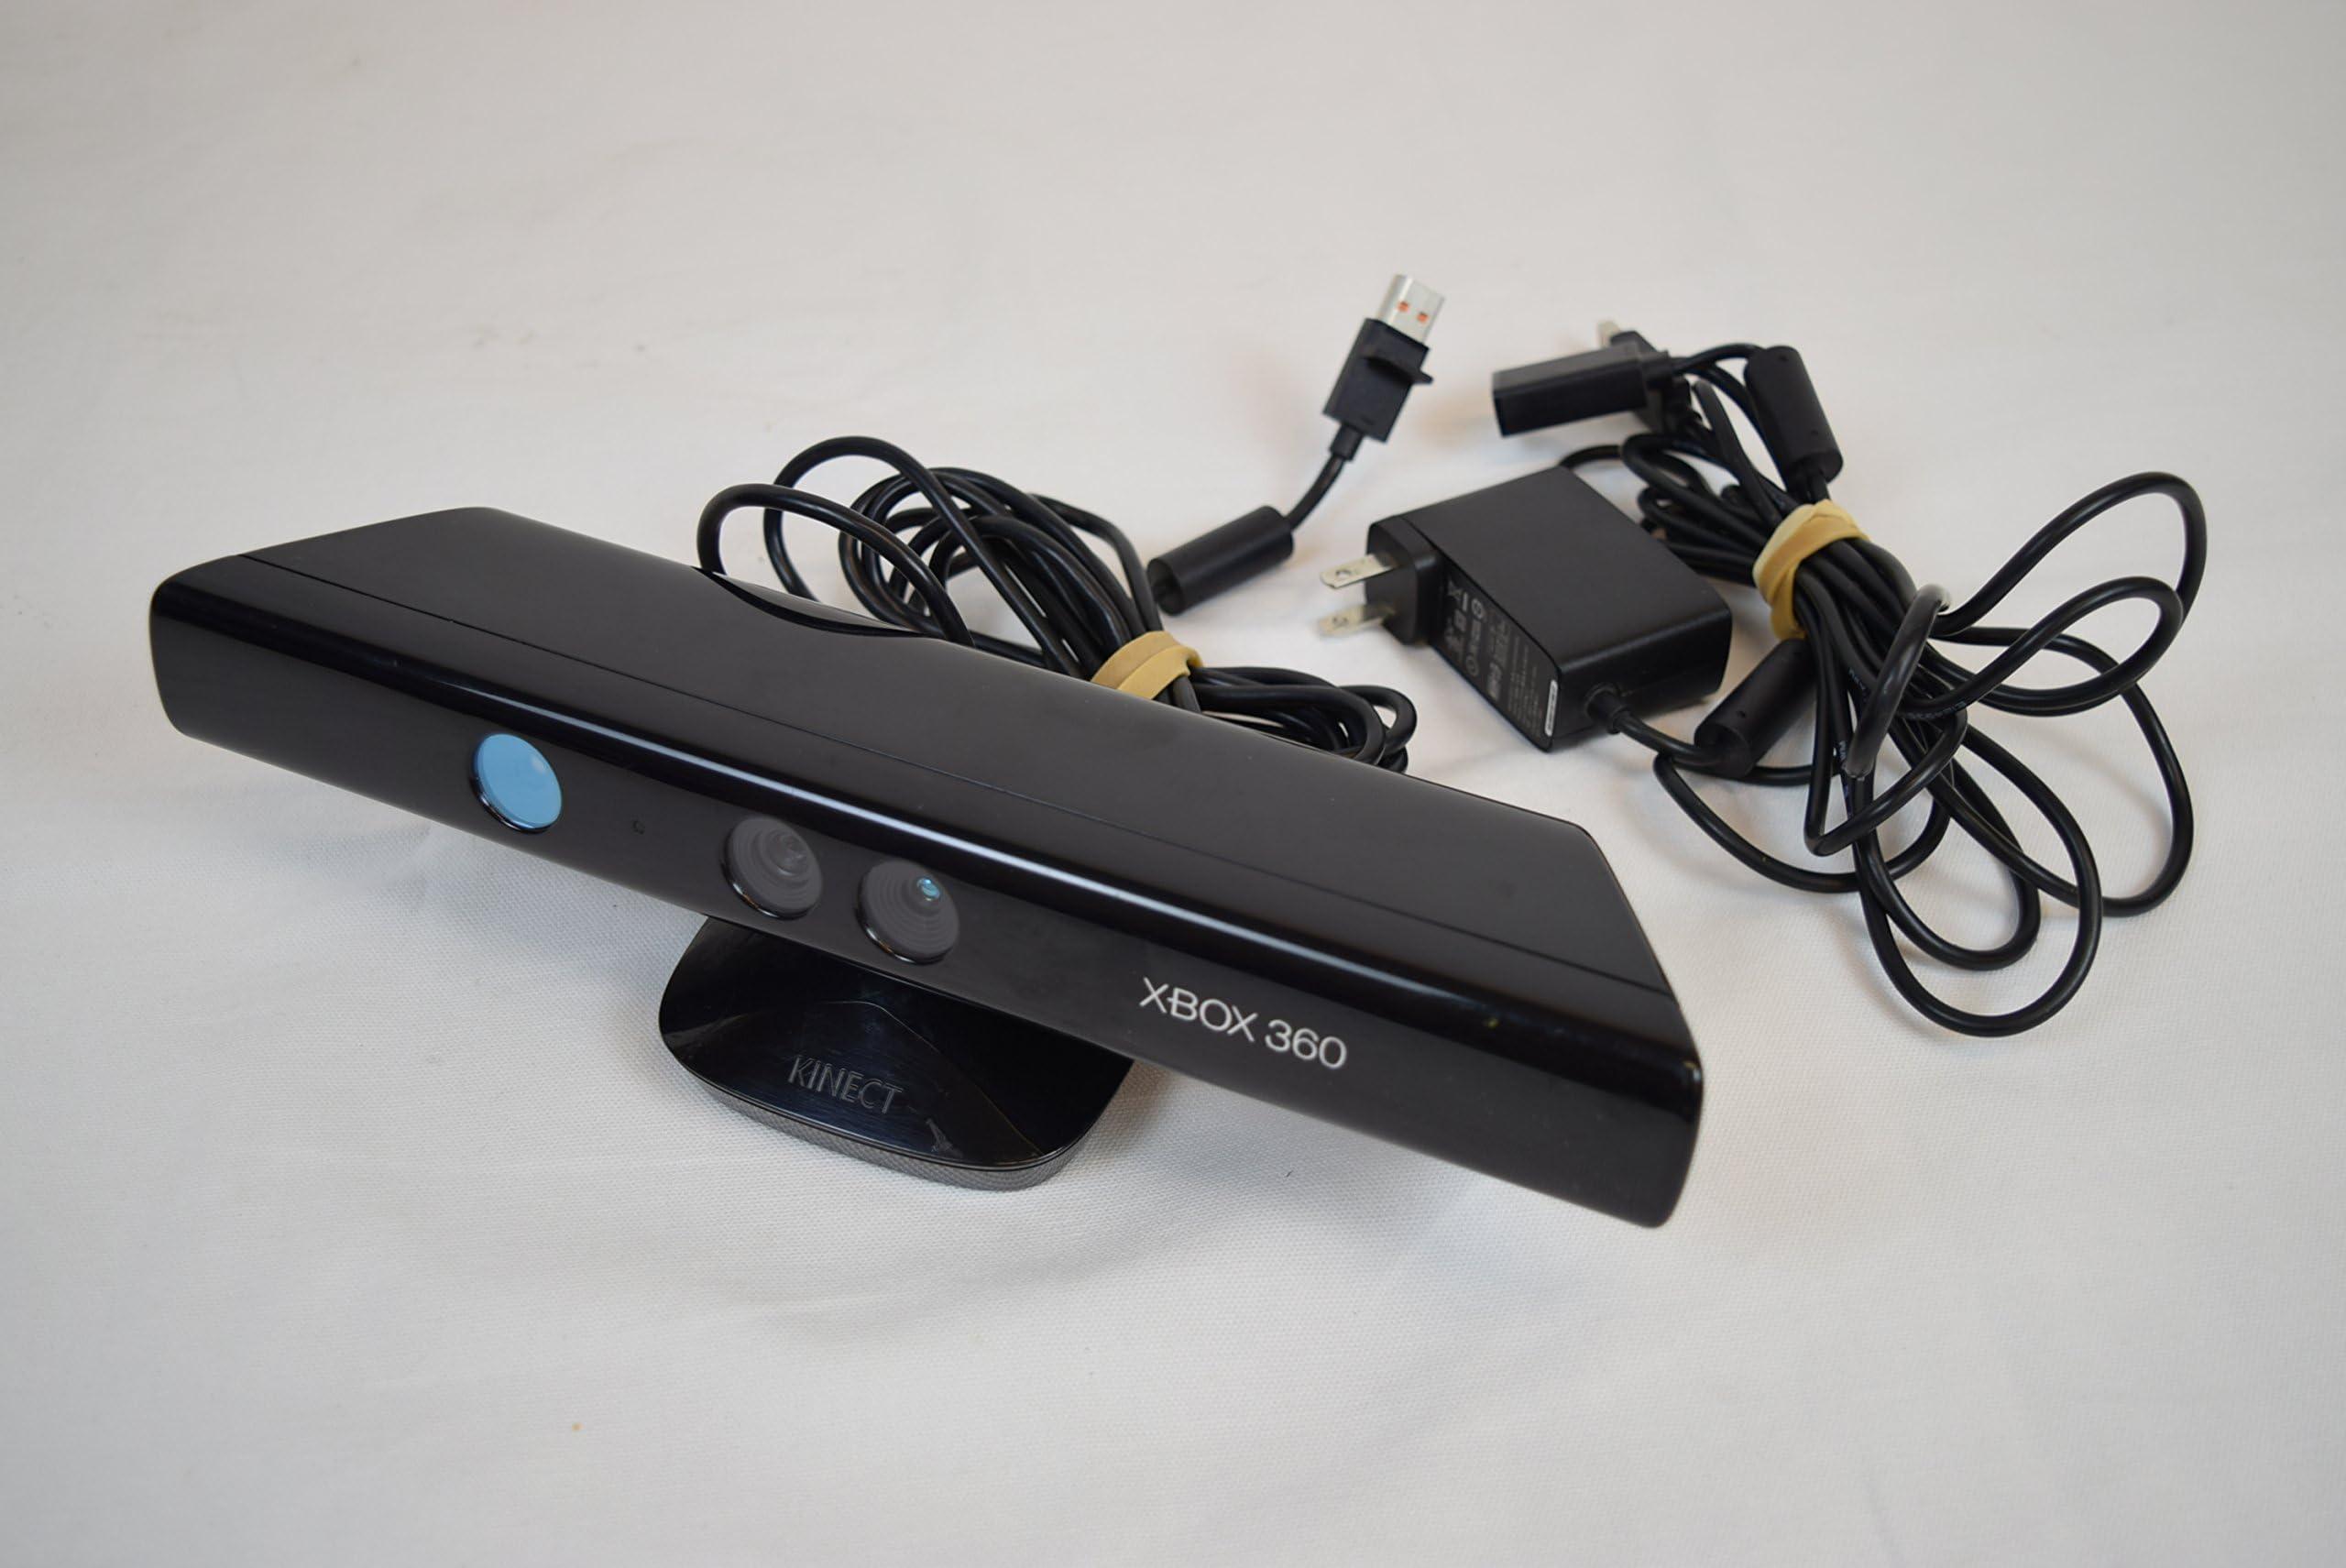 Amazon.com: XBOX 360 Microsoft Kinect Sensor Bar Only Black 1414 ...